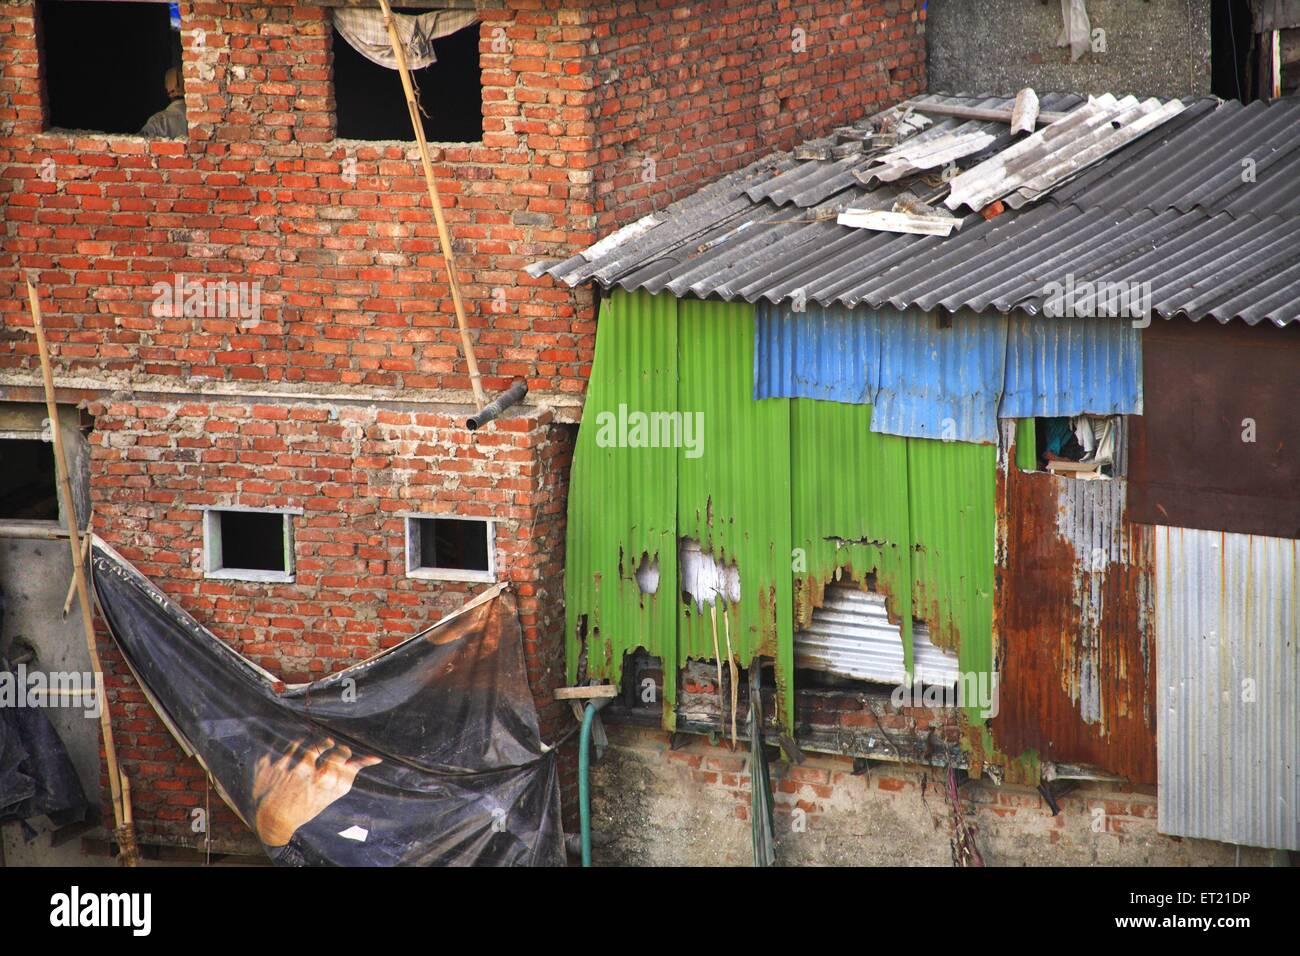 Slum ; Behram Naupada ; Anant Kanekar Marg ; Bandra ; Bombay Mumbai ; Maharashtra ; India 17 September 2009 - Stock Image